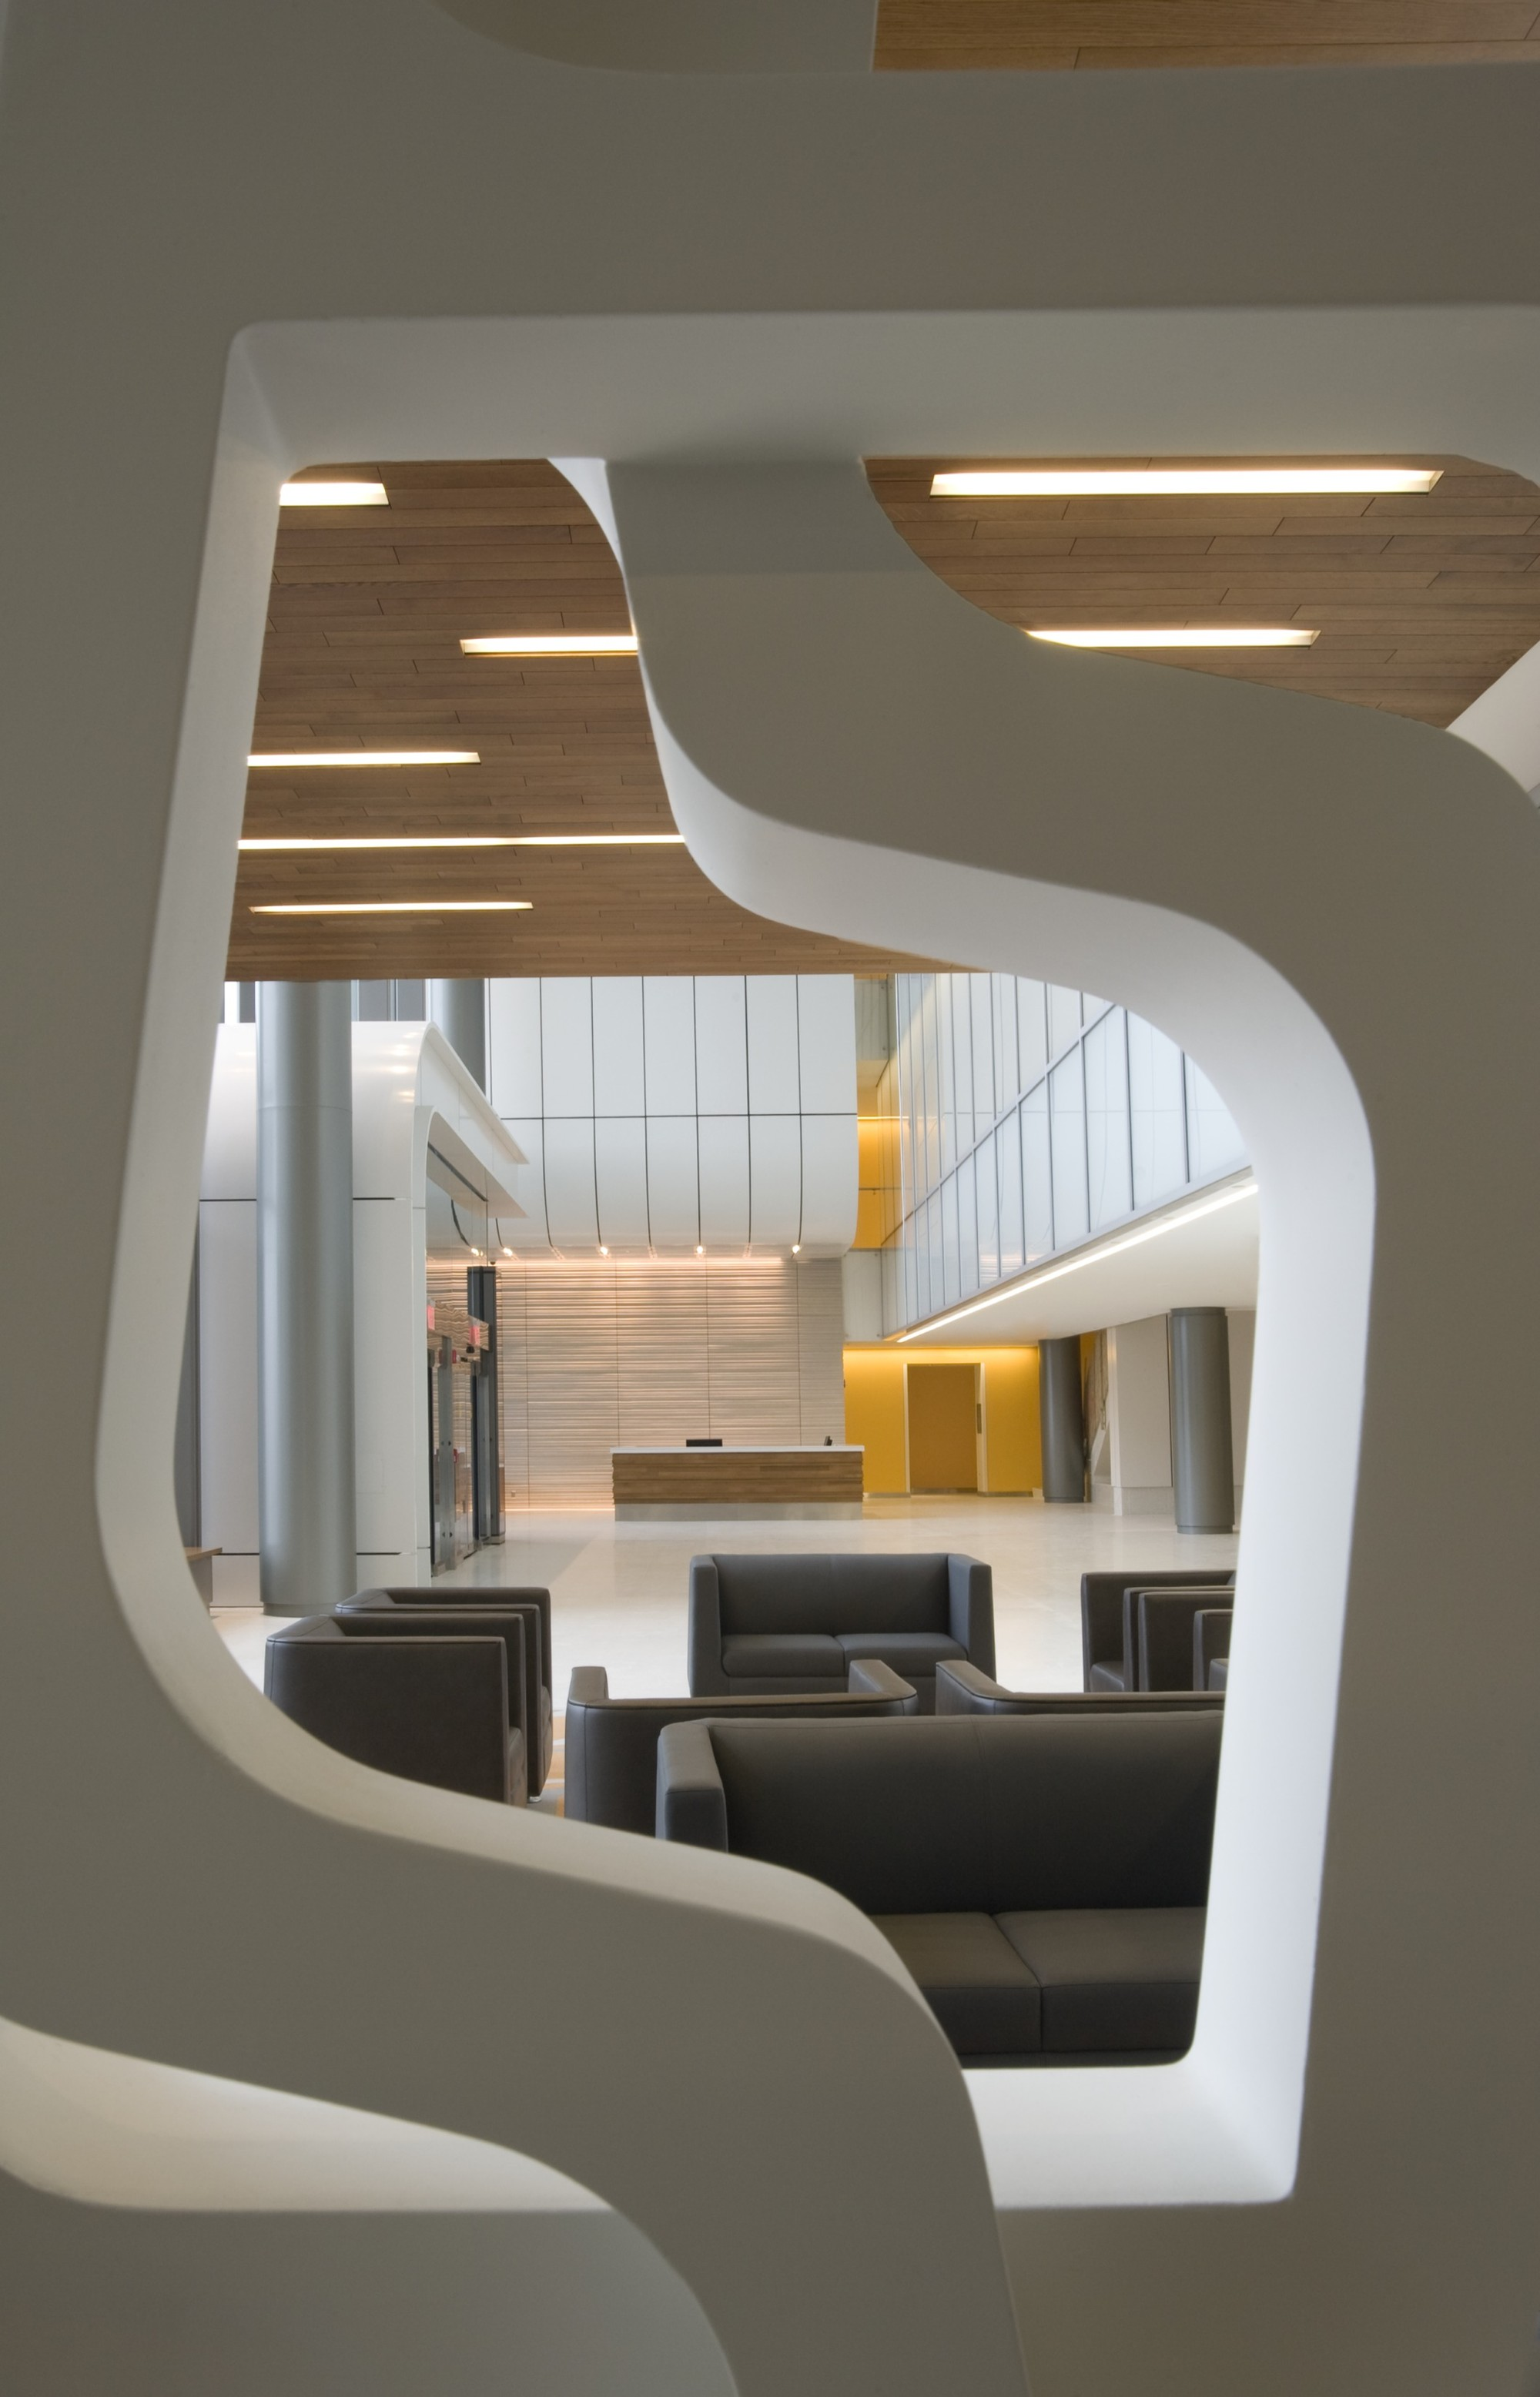 Gates Interior Design New Gallery Of Kaleida Health Gates Vascular Institute  Cannon Design  7 Inspiration